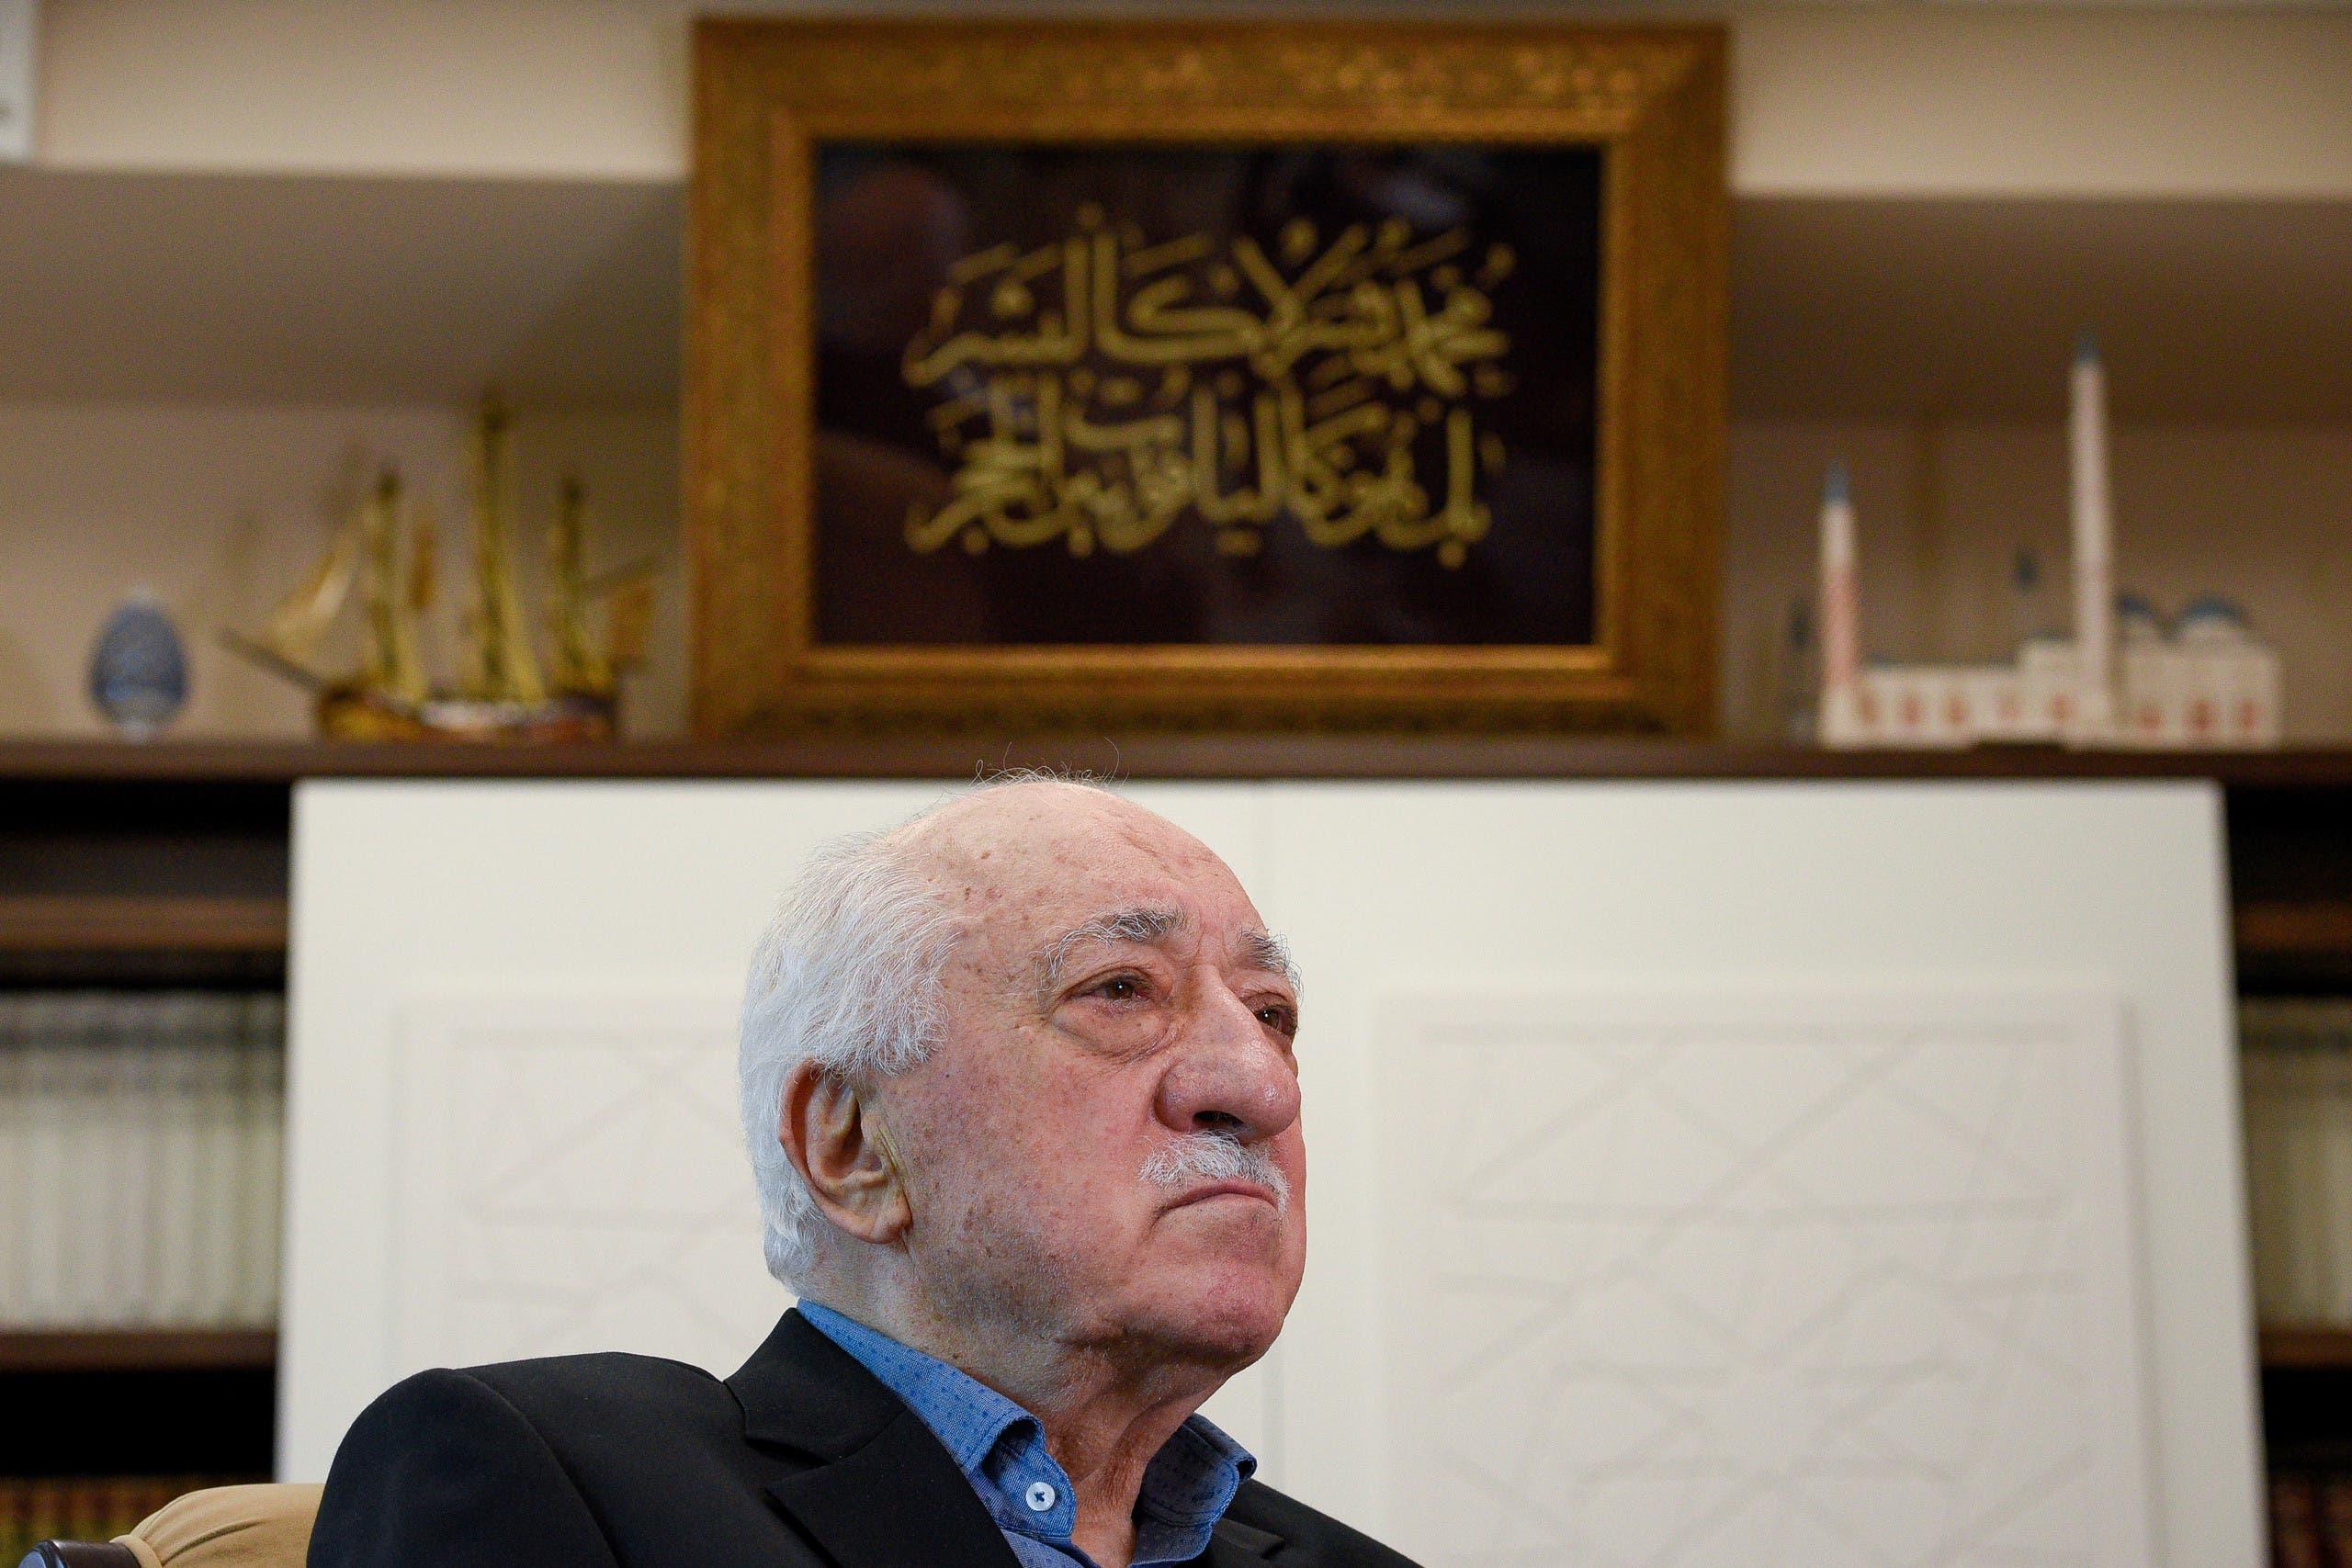 Fethullah Gulen at his home in Saylorsburg, Pennsylvania on July 10, 2017. (Reuters)